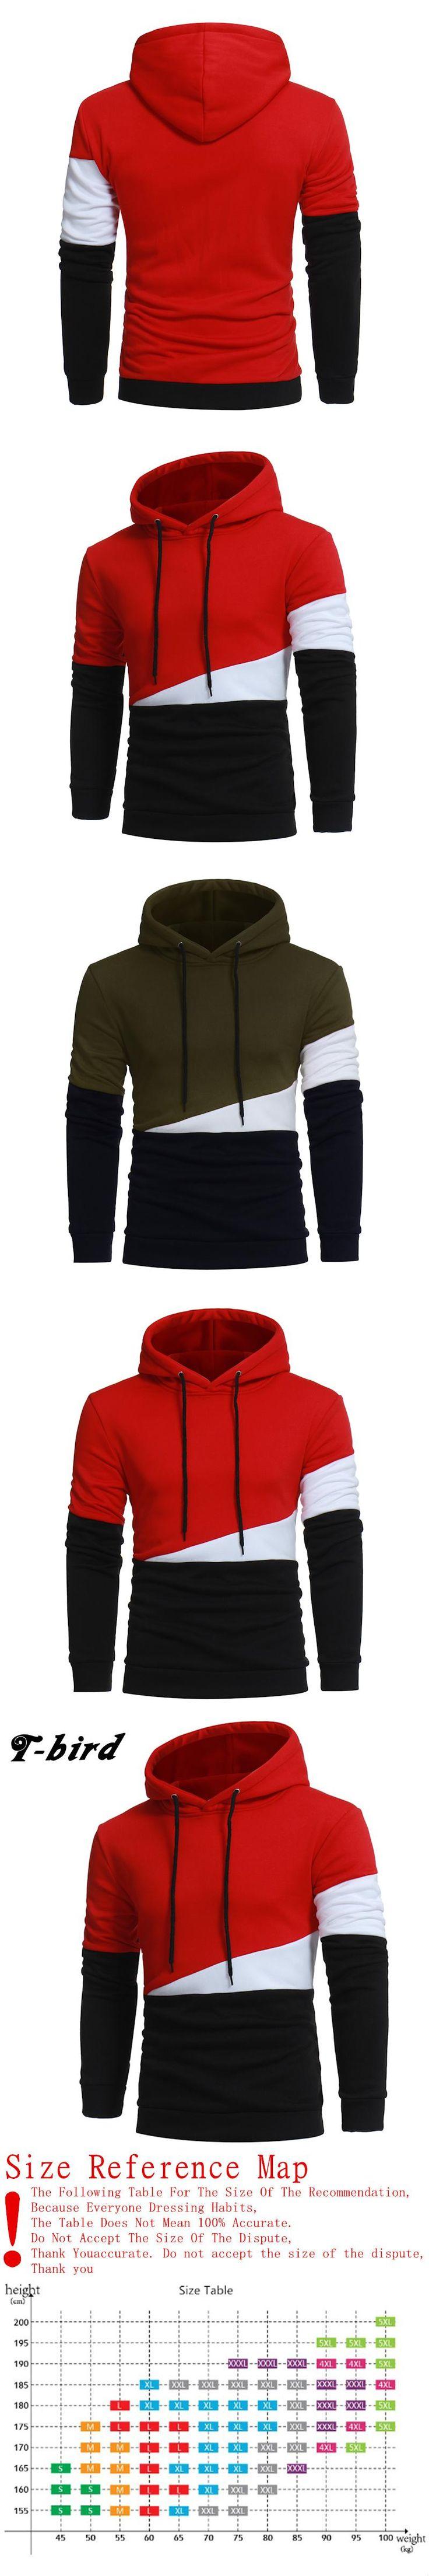 T-Bird Brand Hoodies Men 2017 Male Long Sleeve Hoodie Black&White Sweatshirt Mens Moletom Masculino Hoodies Slim Tracksuit XXXL